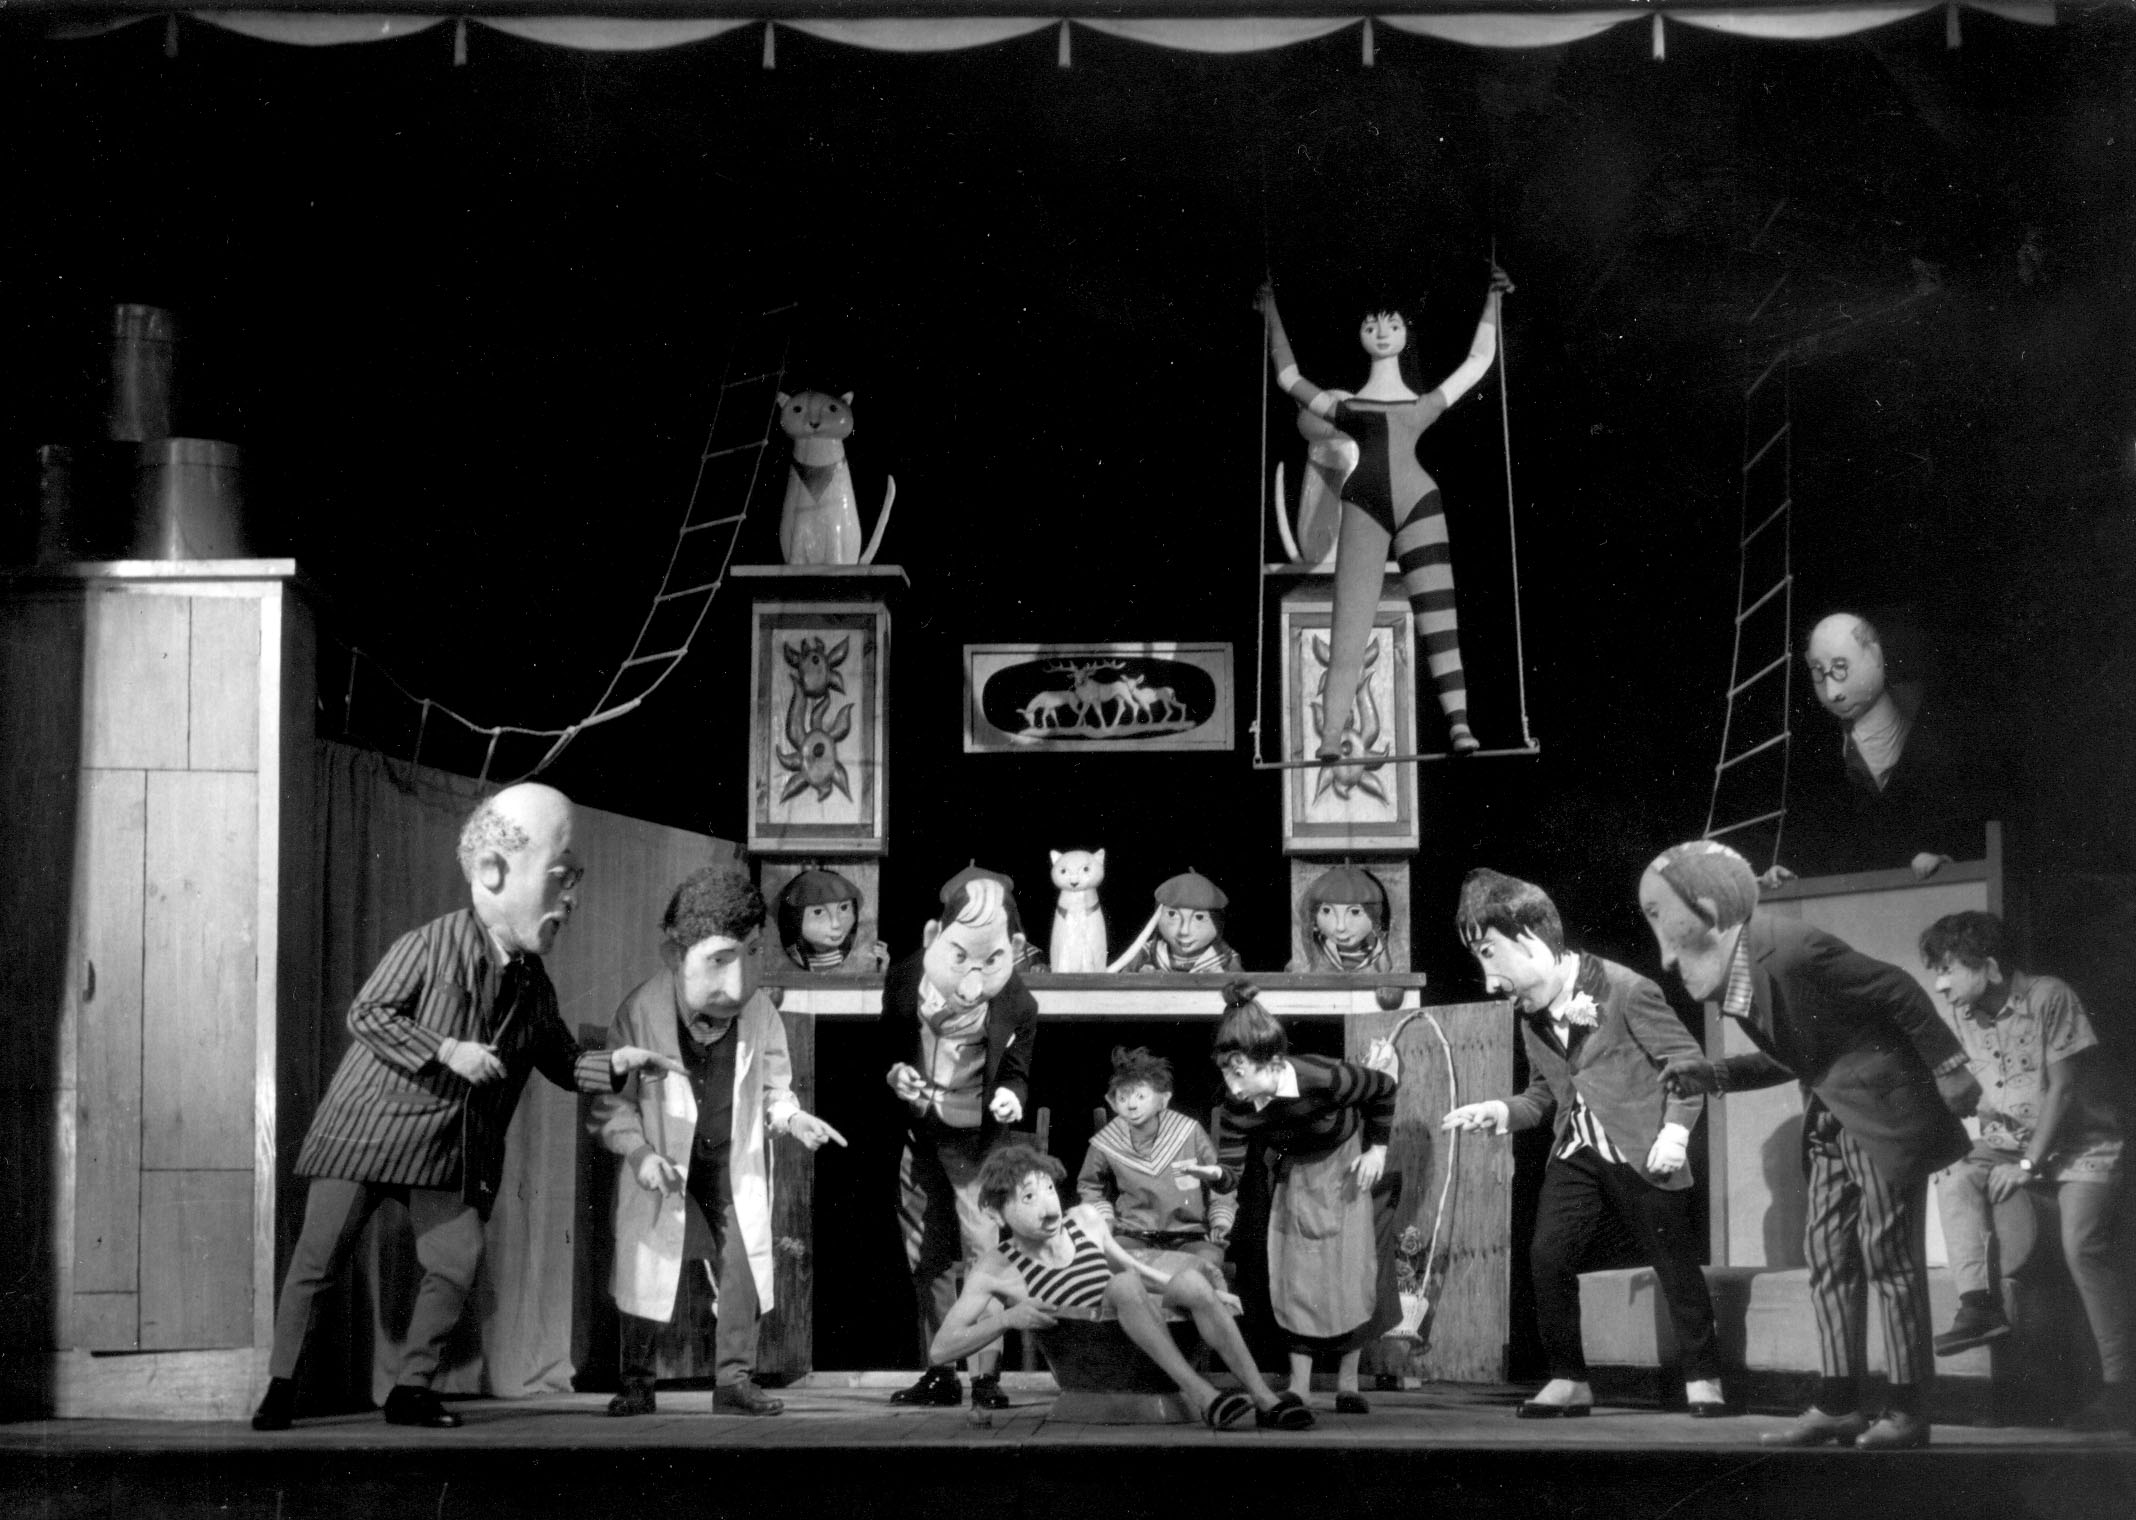 <em>Męczeństwo Piotra Oheya</em> (Le Martyre de Piotr Ohey, 1959) de Sławomir Mrożek, réalisé par Teatr Groteska (Cracovie, Pologne), mise en scène : Zofia Jaremowa, scénographie : Kazimierz Mikulski. Collection : Teatr Groteska. Photo: Juliusz Wolski